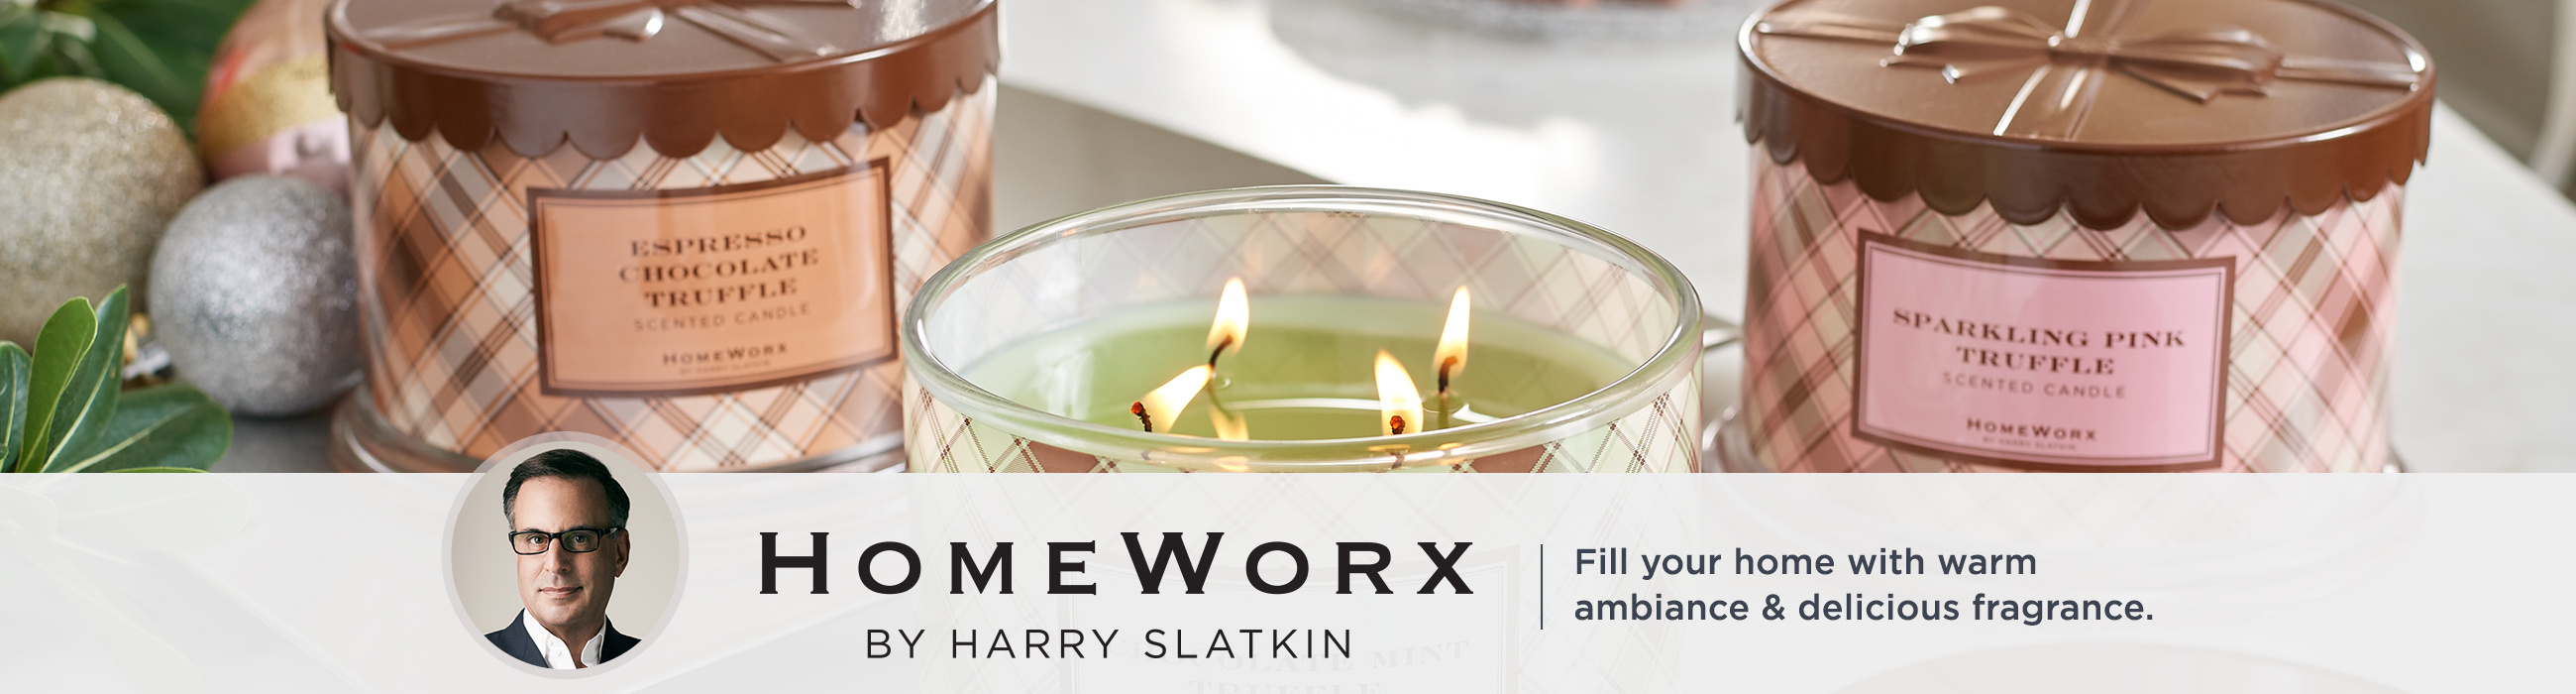 Homeworx by Harry Slatkin - Make the holidays shine with fragranced candles & more